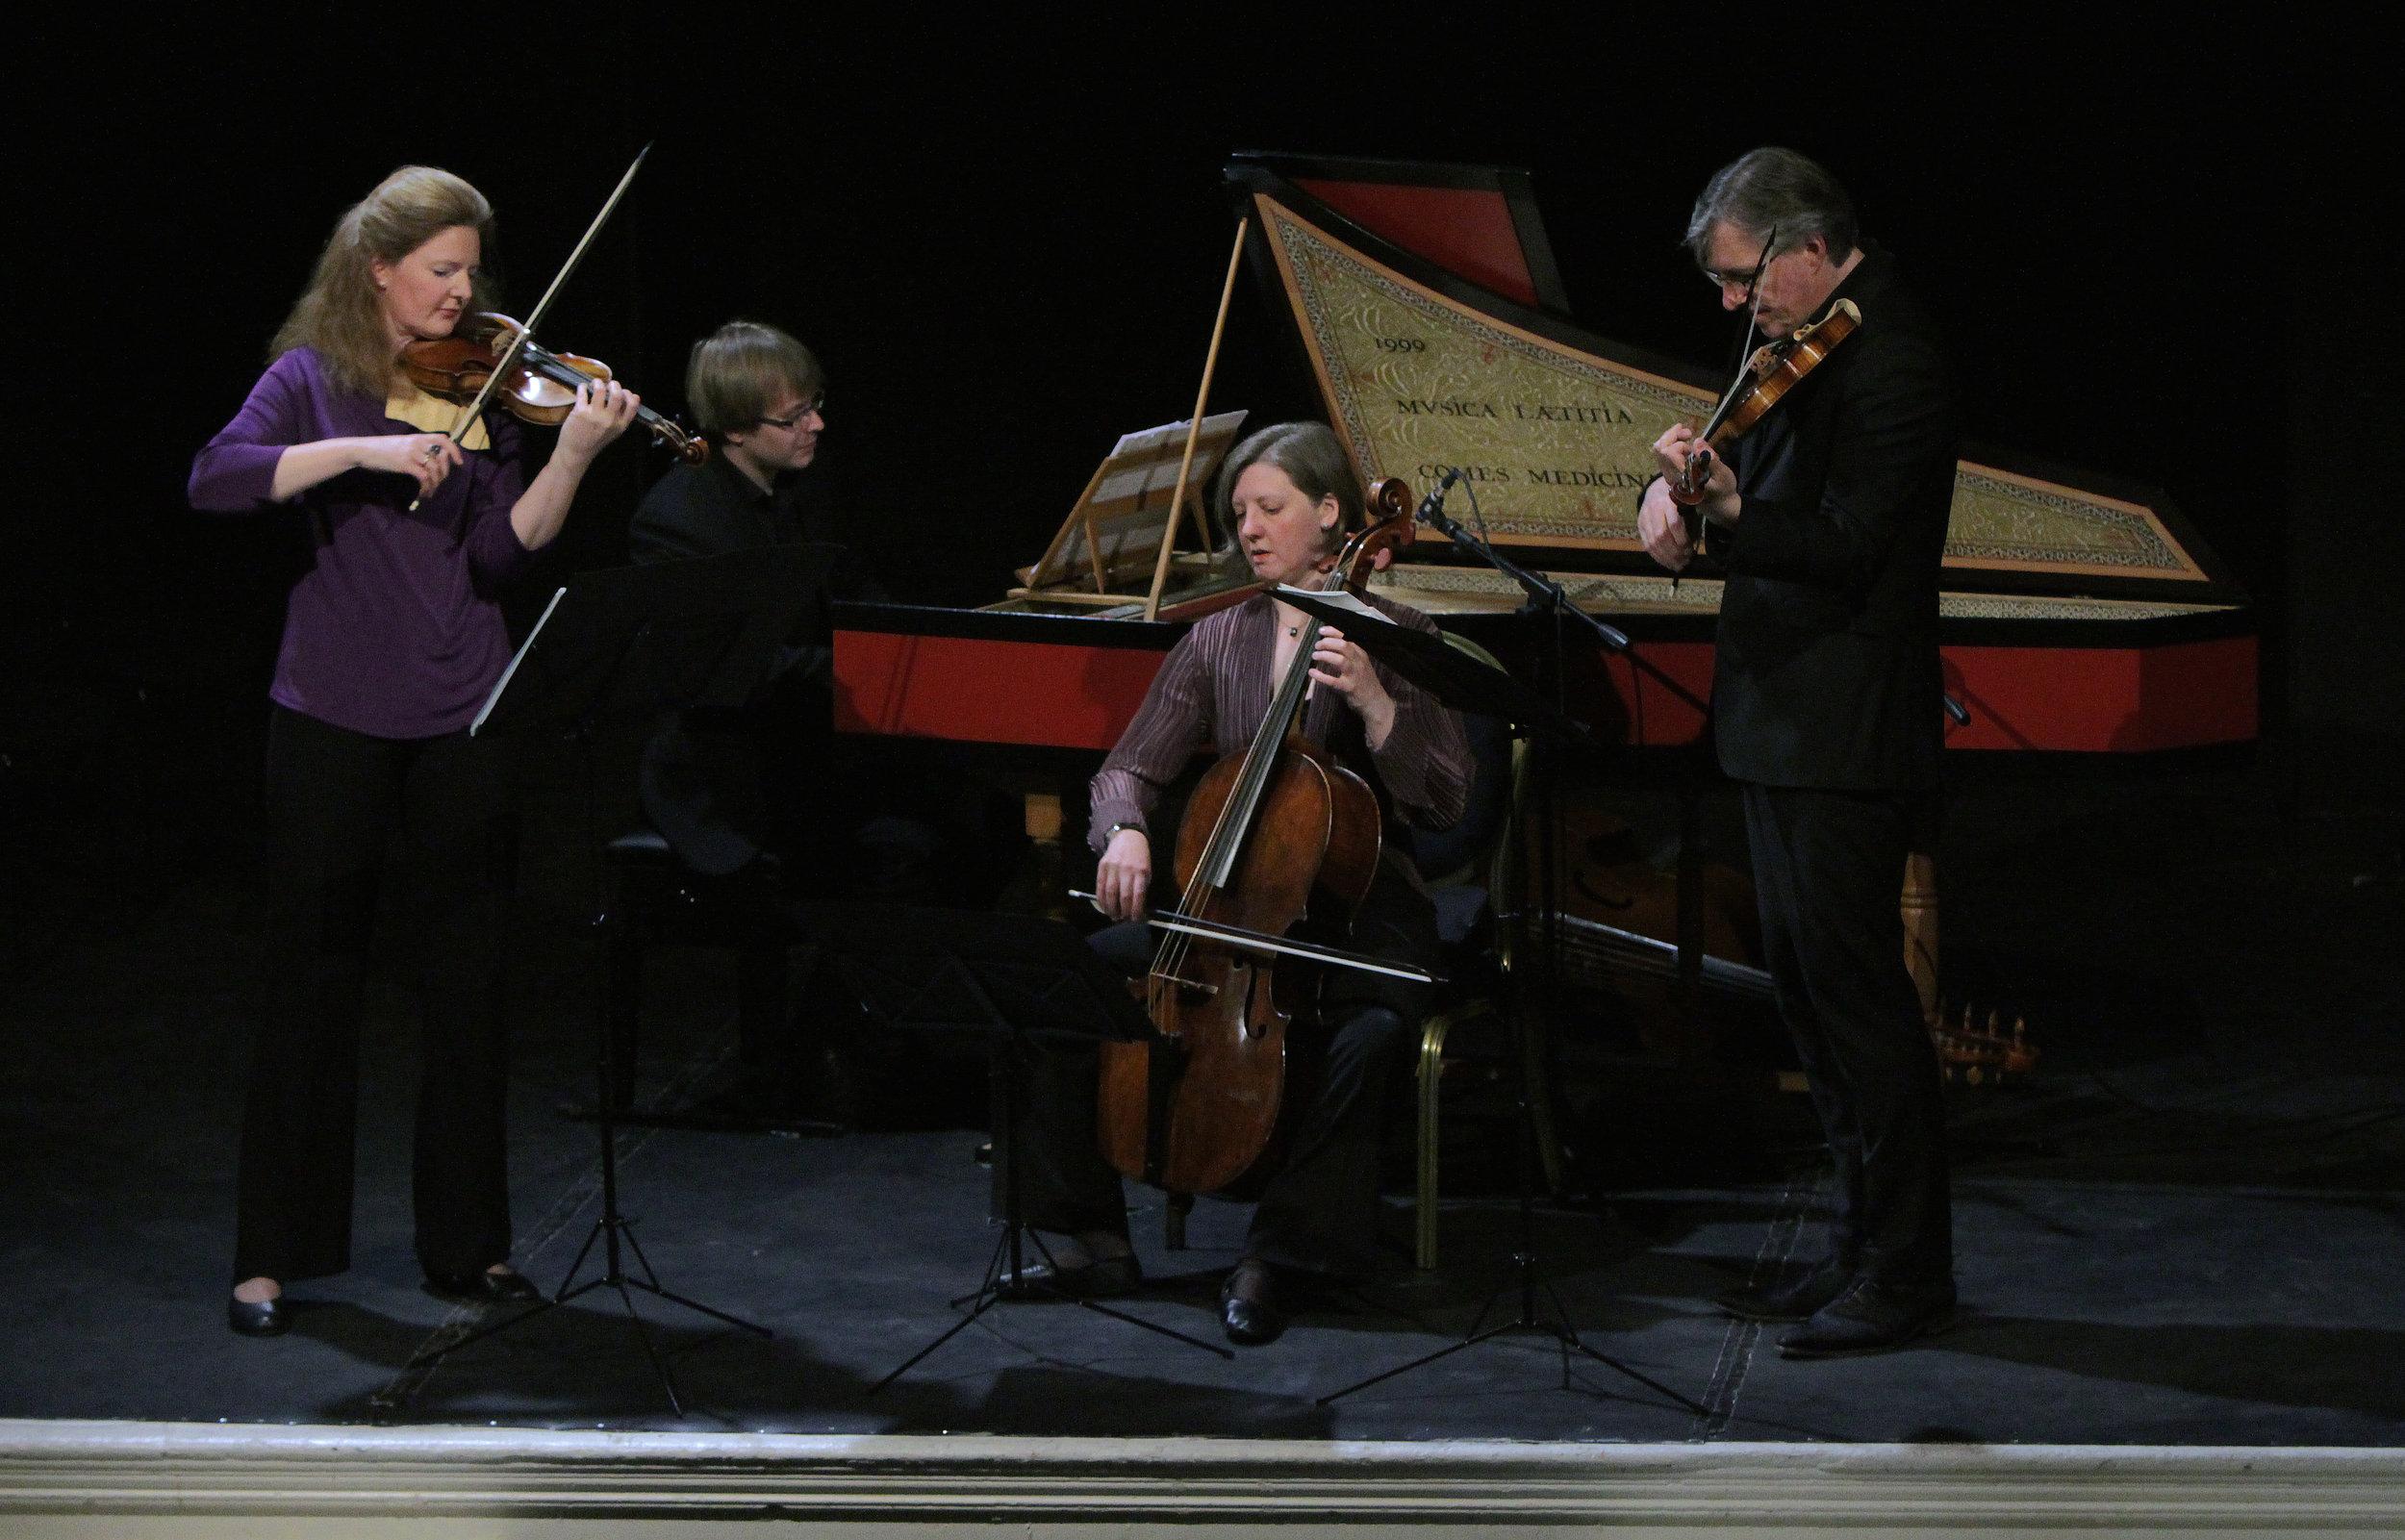 BAROQUE LONDON. MUSIC FOR COURT AND SALON - May 13, 2015. londonRachel Podgerdirector/violinBrecon BaroqueIllustrated talk by Richard WigmoreHandel - Trio Sonata in D major, Op. 5 No. 2, HWV 397Handel - Trio Sonata in G minor, Op. 2 No. 8, HWV 393Handel - Violin Sonata in A major, Op. 1 No. 3, HWV 361Geminiani - Violin Sonata in D minor, Op. 4 No. 8Purcell - 10 Sonatas in 4 parts: No. 6 in G minor, Z807in E flat major 12 Sonatas of 3 parts: No. 6 in C major, Z795; No. 3 in D minor, Z792Boyce - Sonata No. 1 in A minorAvison Sonata for harpsichord, 2 violins and cello in D major, Op. 8 No. 3